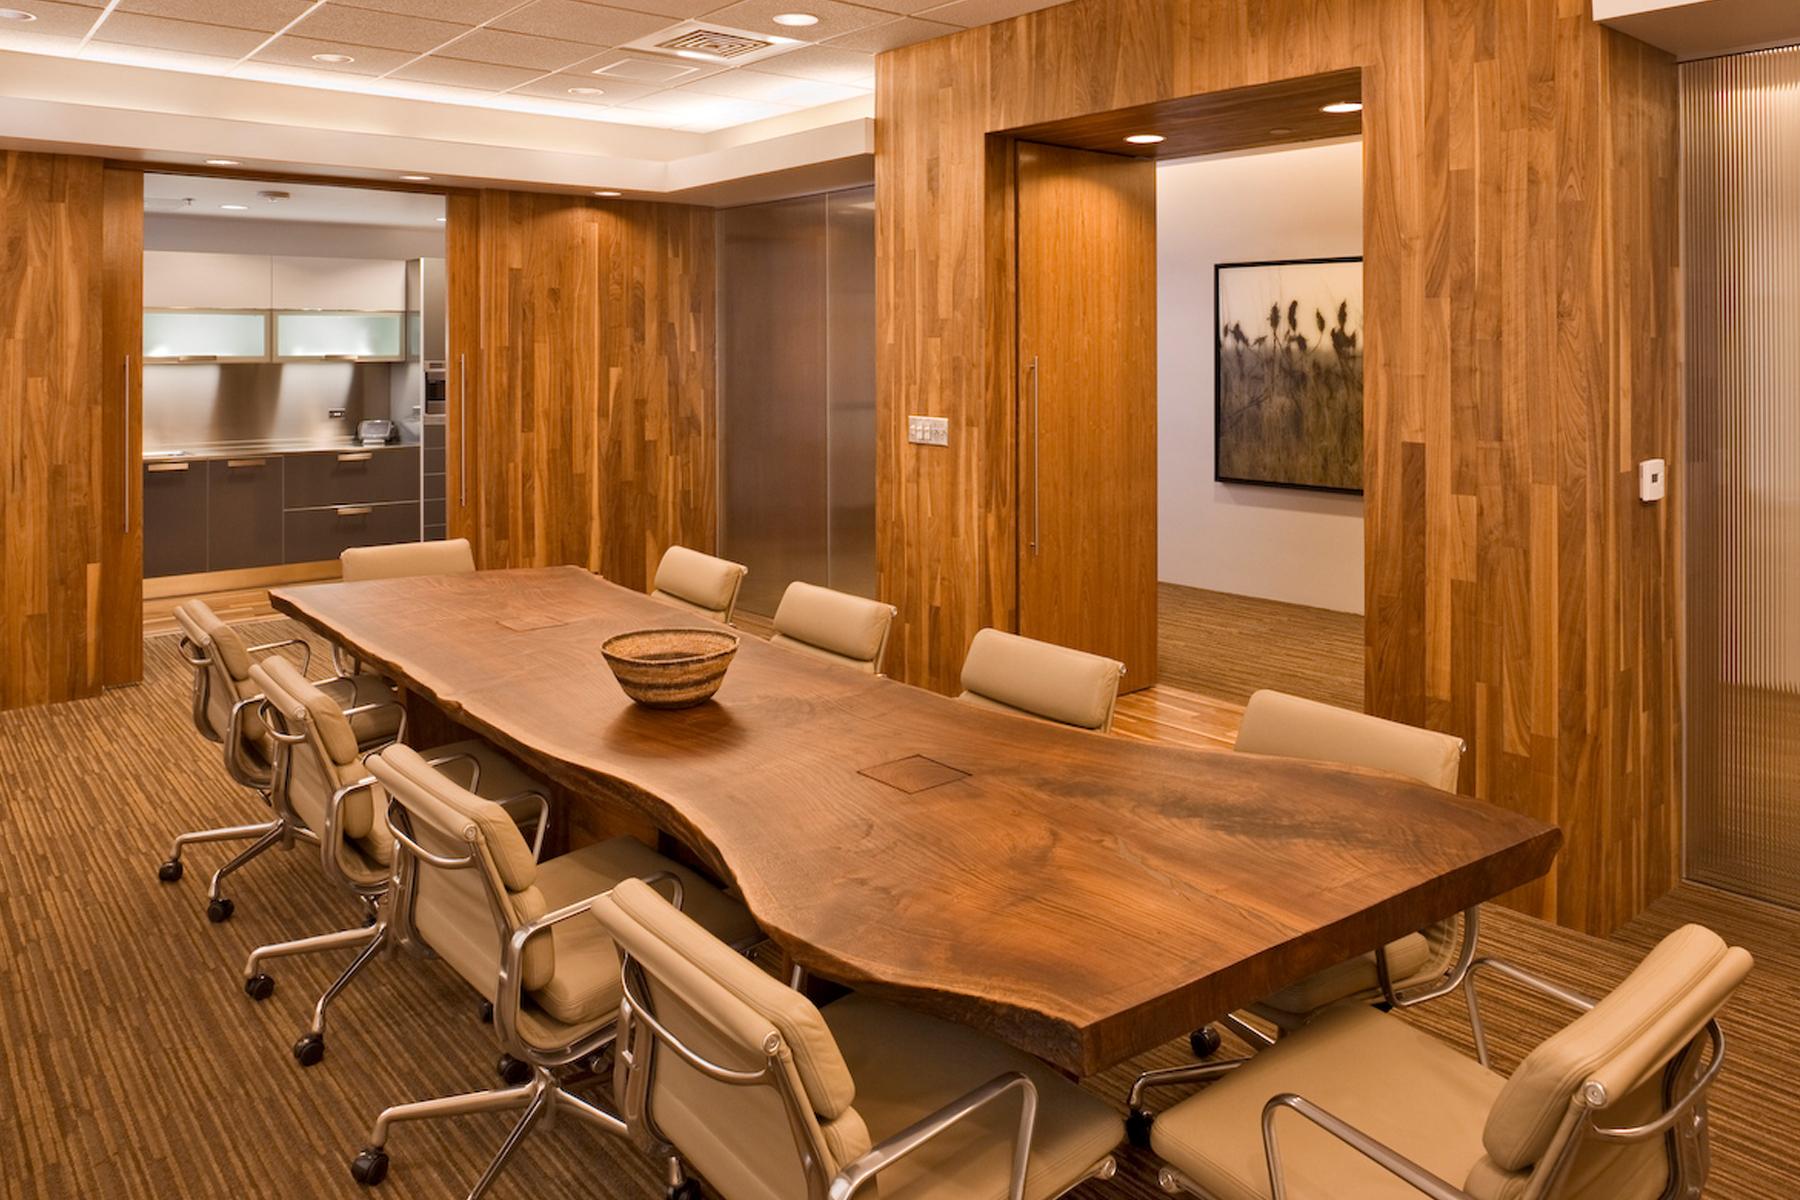 Denver Office Renovation, Colorado- Jordy Construction 1